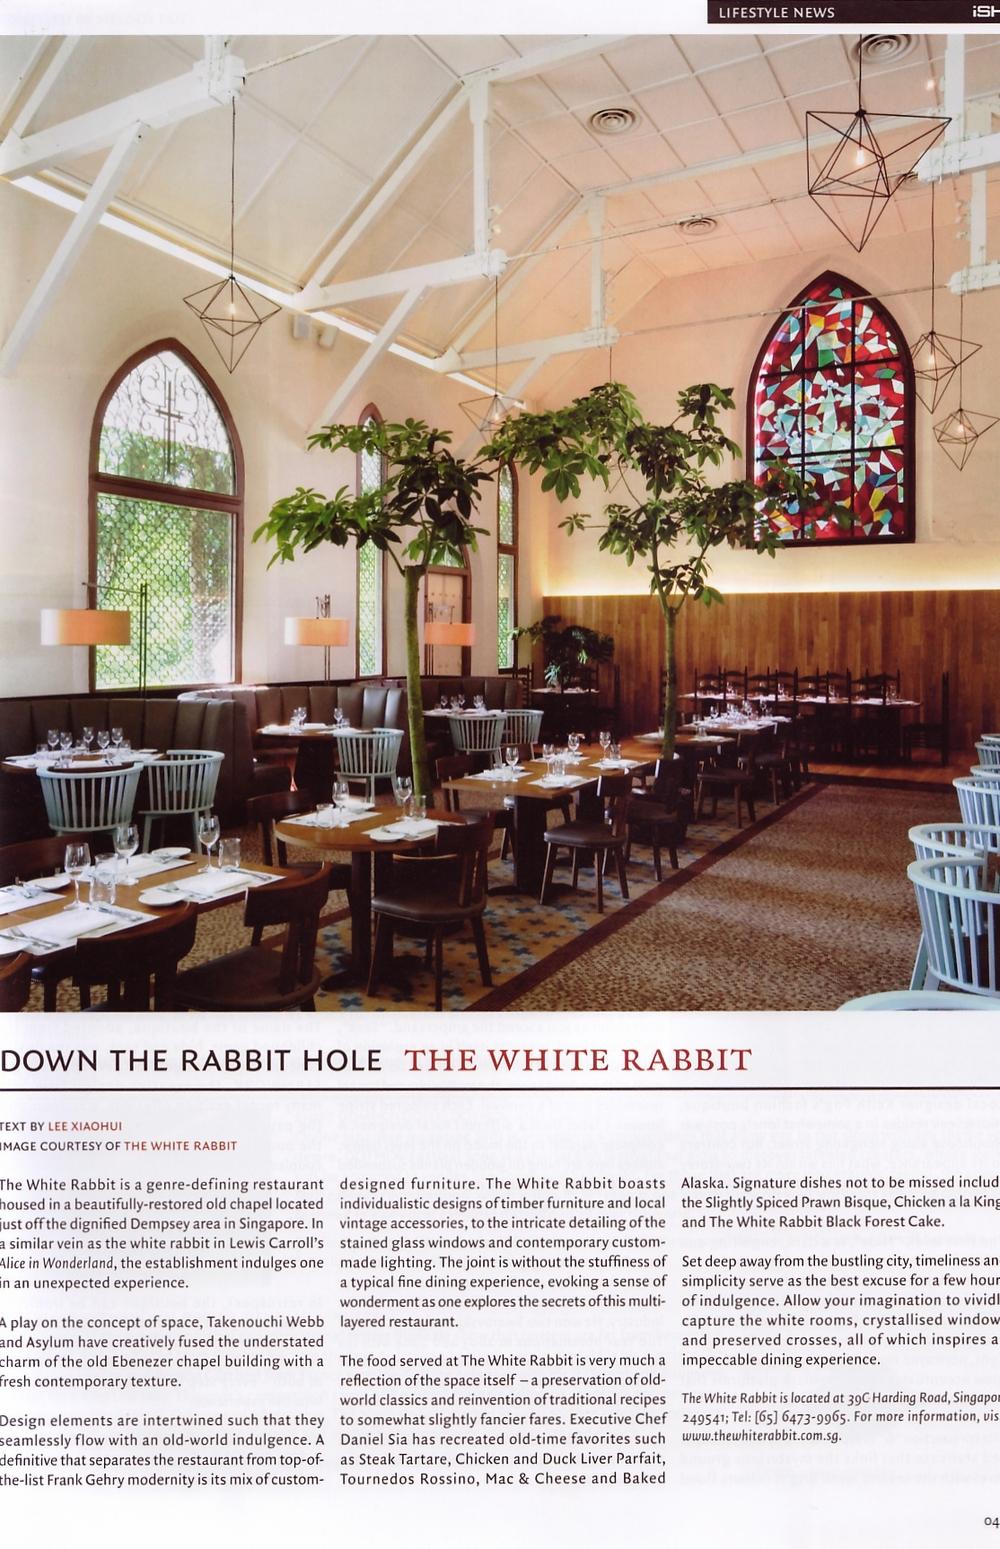 the white rabbit_0002.jpg